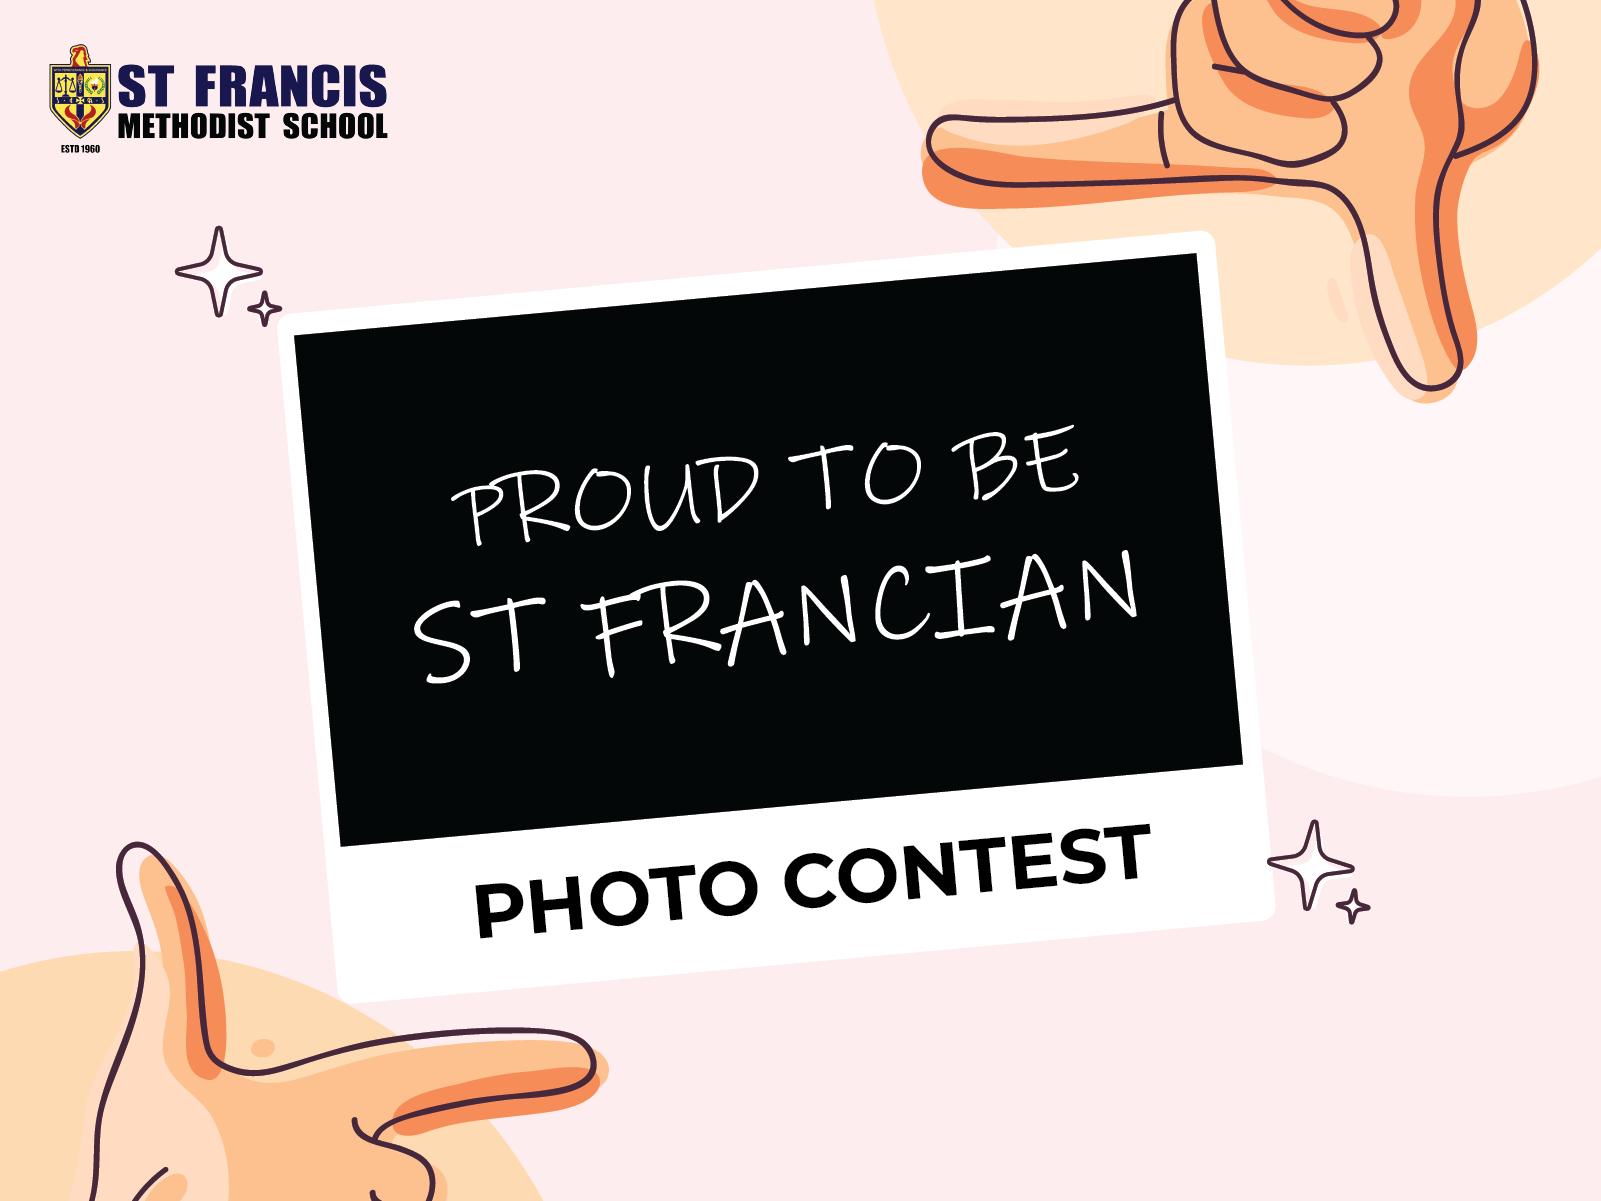 St Francian Photo Contest